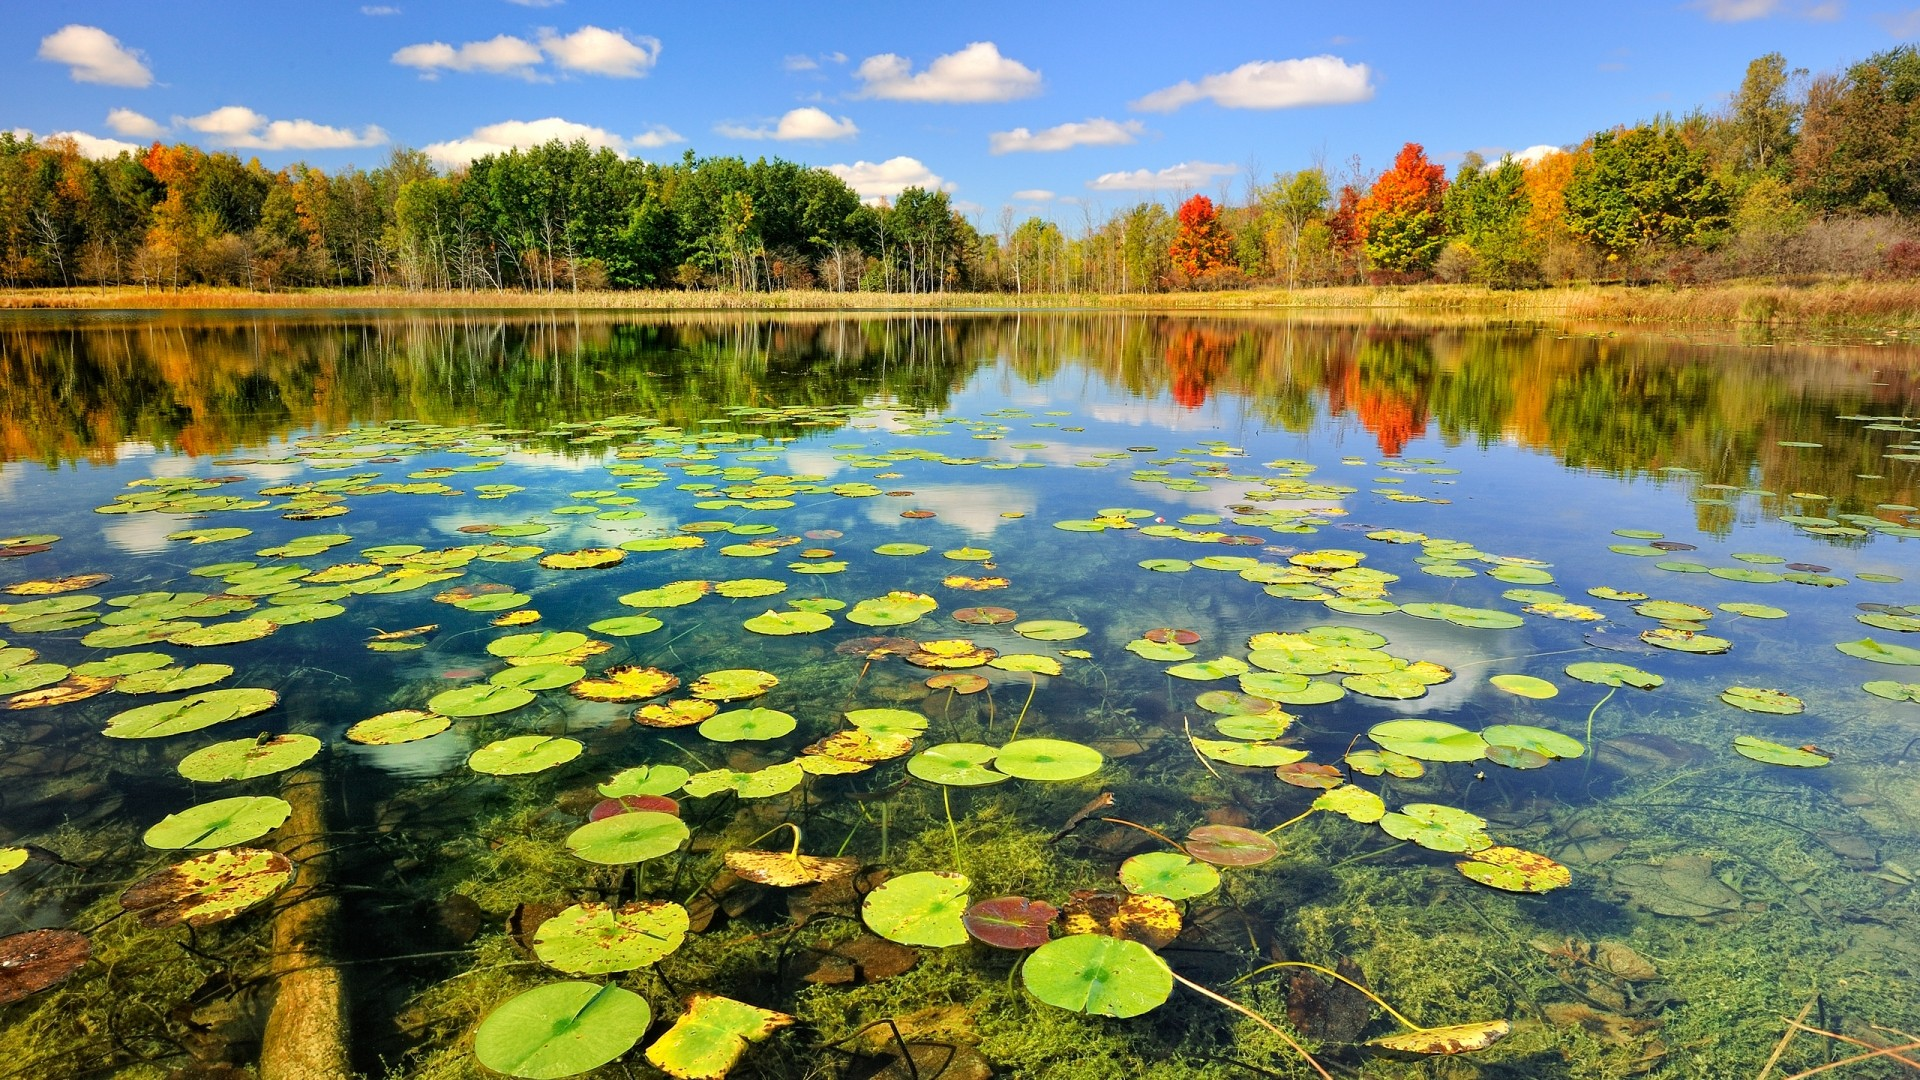 pond-wallpapers-14.jpg